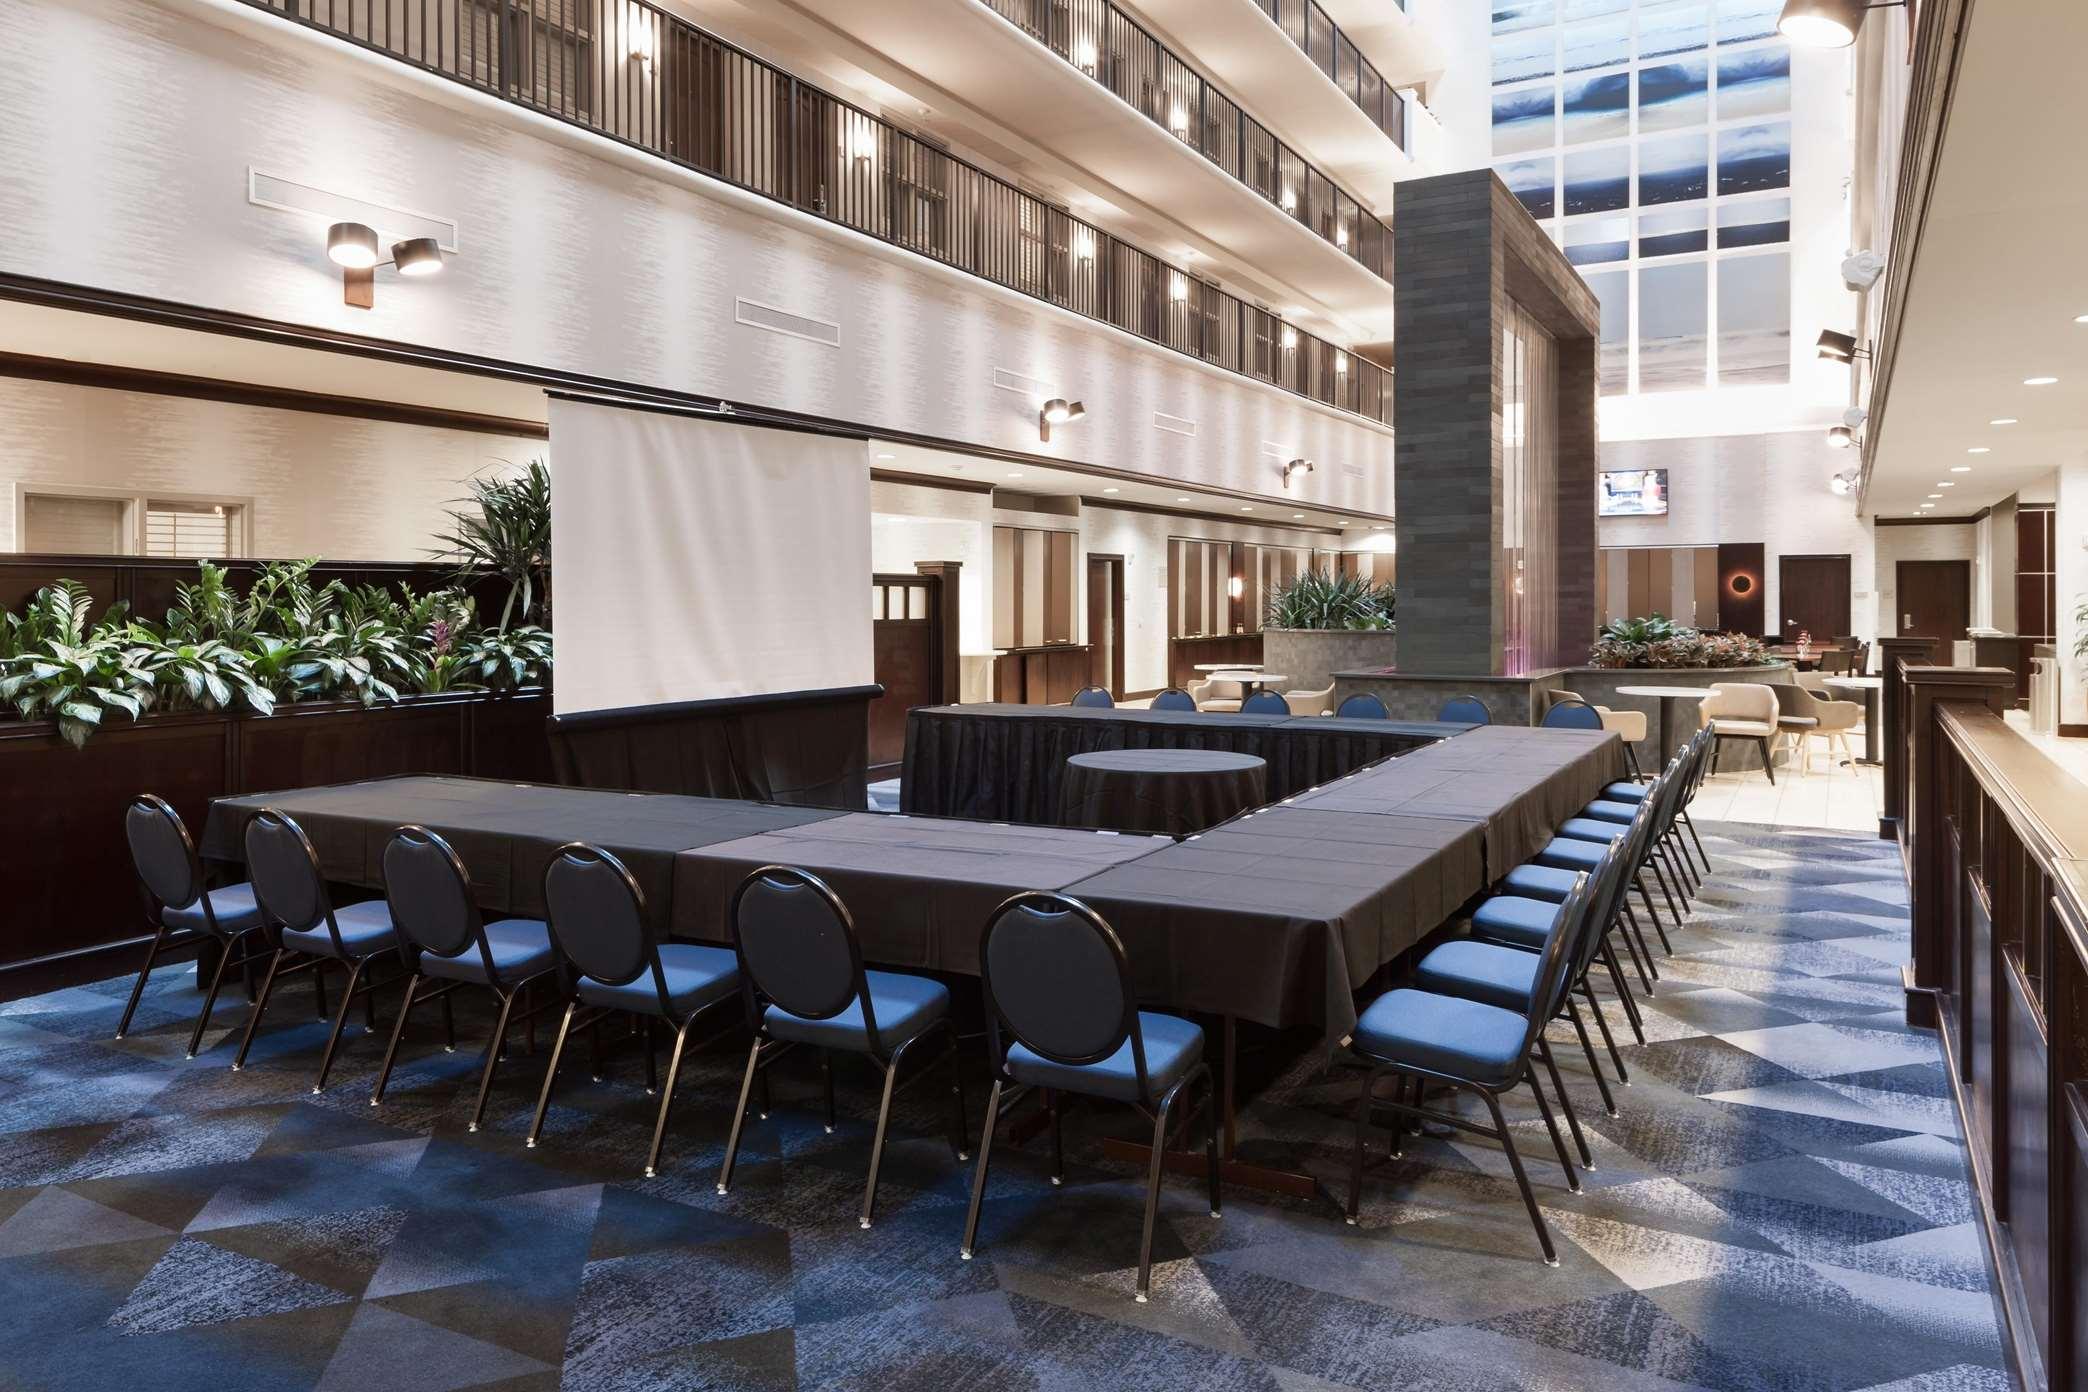 Embassy Suites by Hilton Tampa Brandon image 2